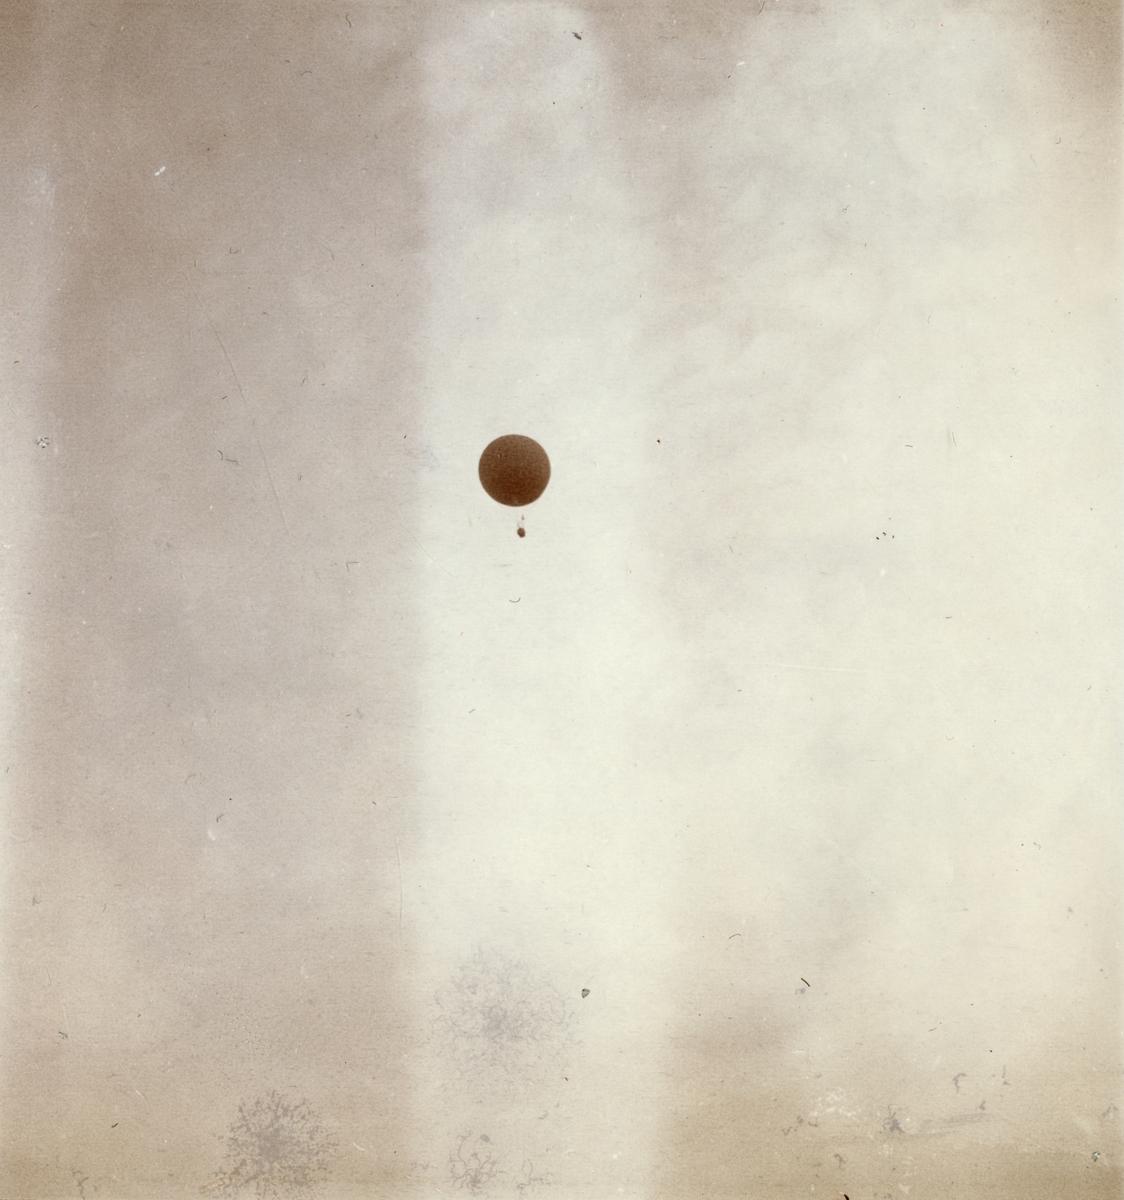 Luftballongen Andrée i luften.